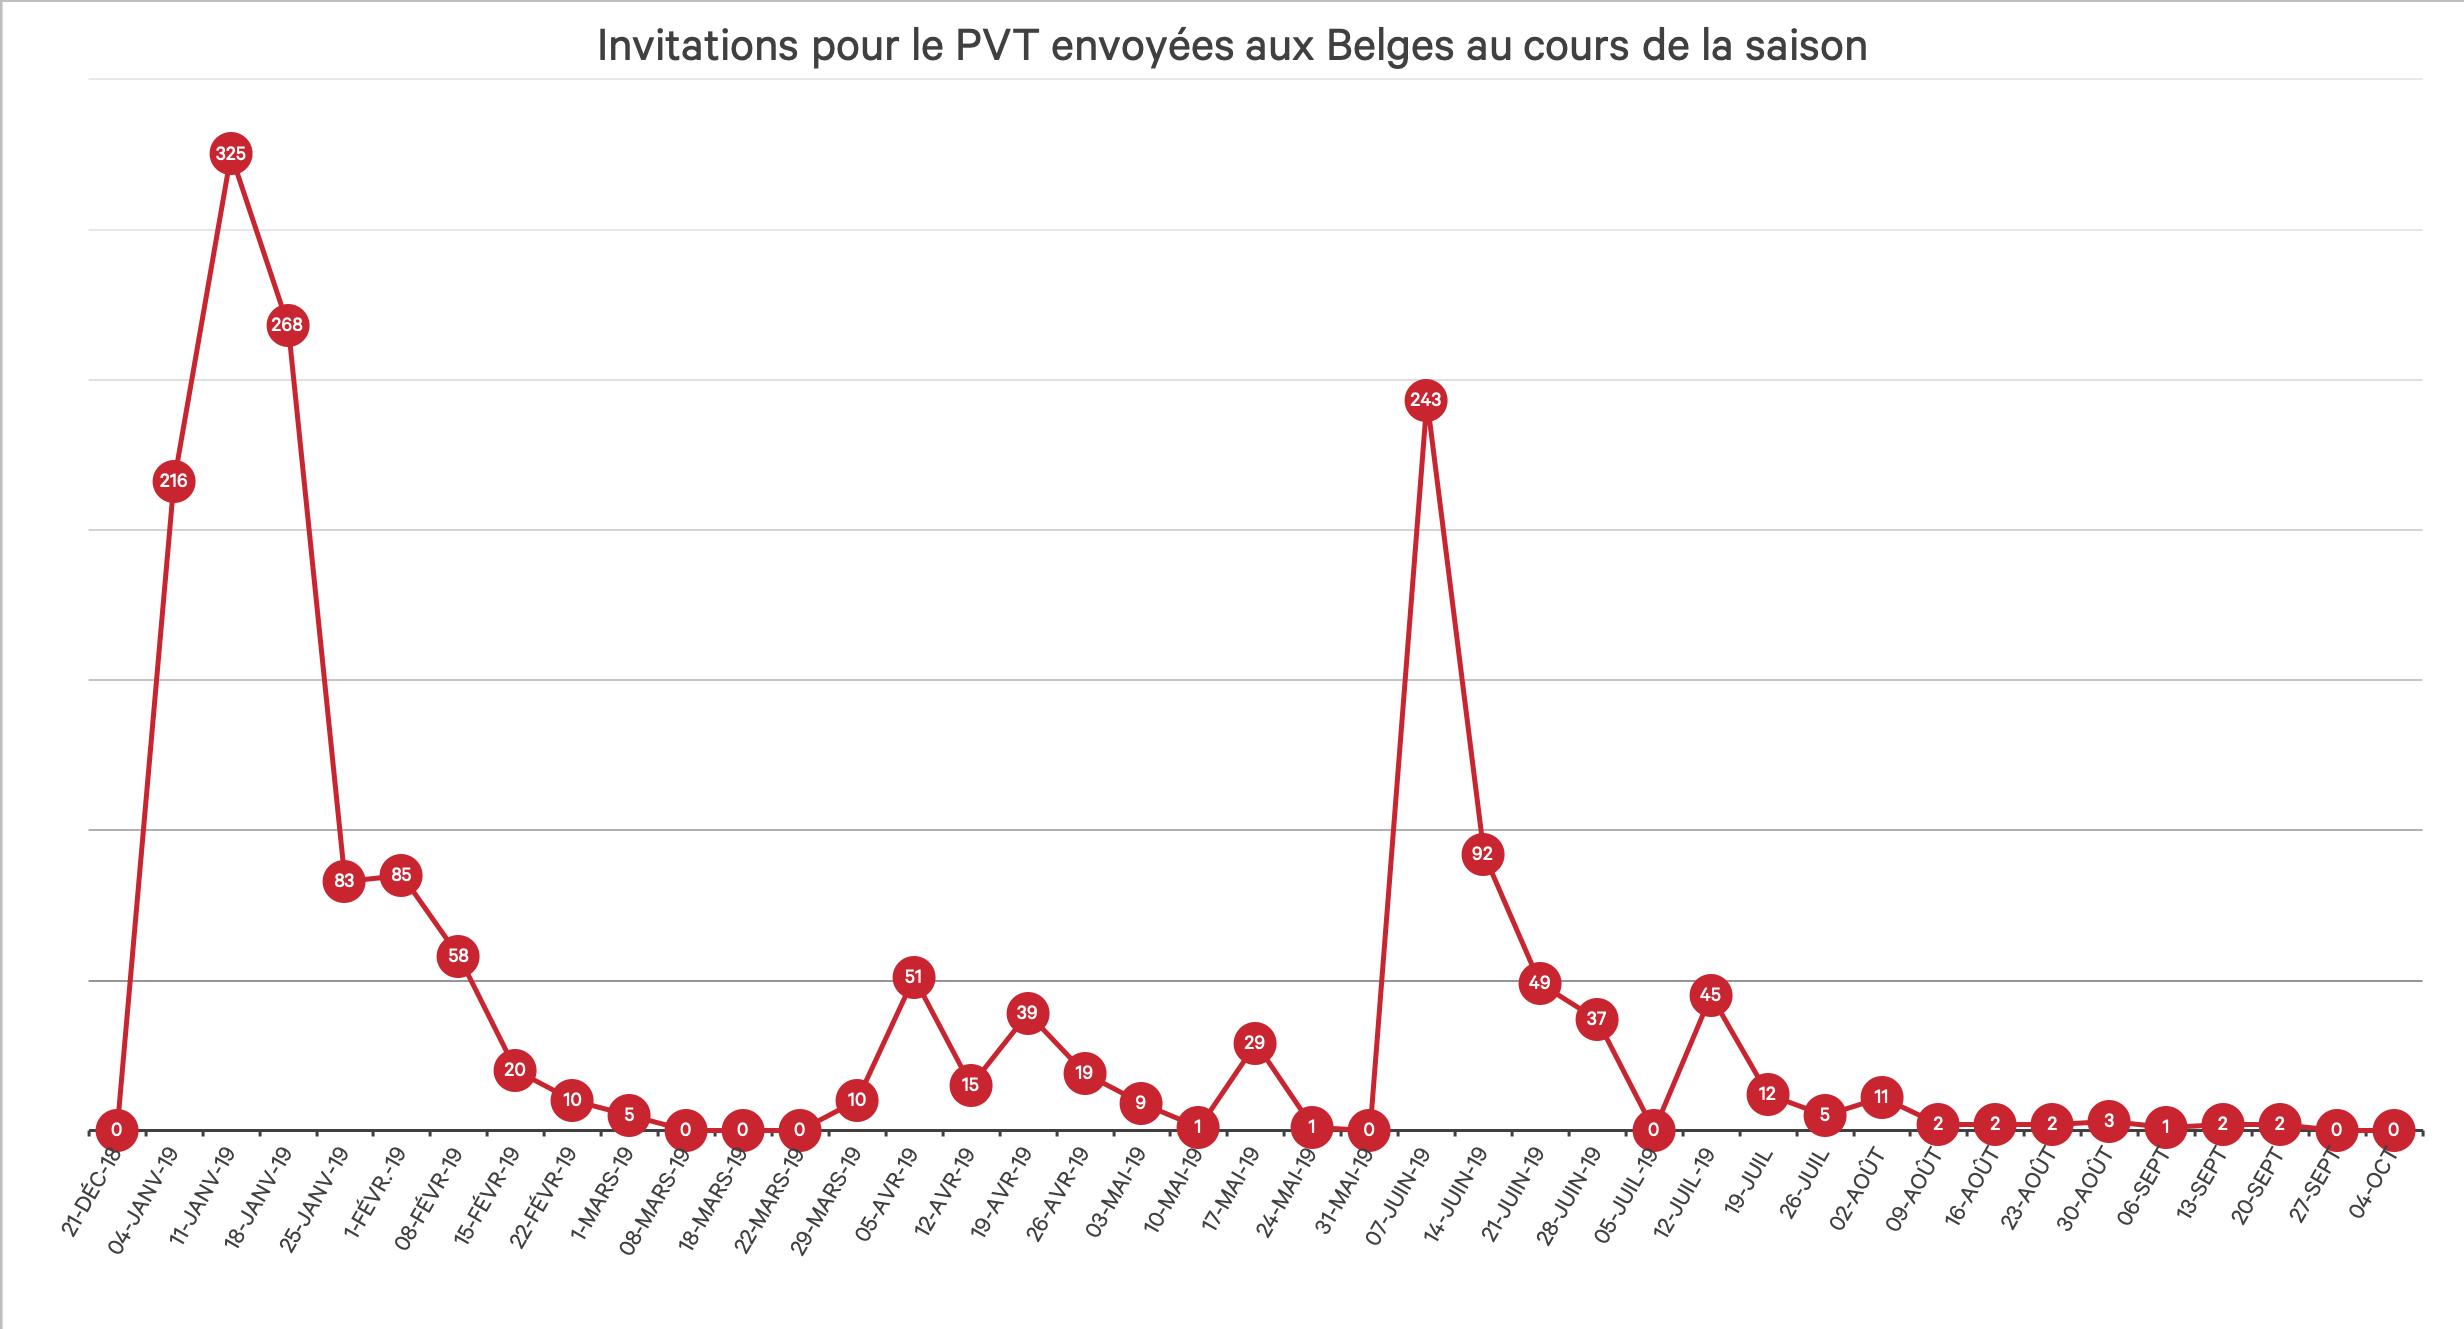 Invitations-PVT-Belges-2019